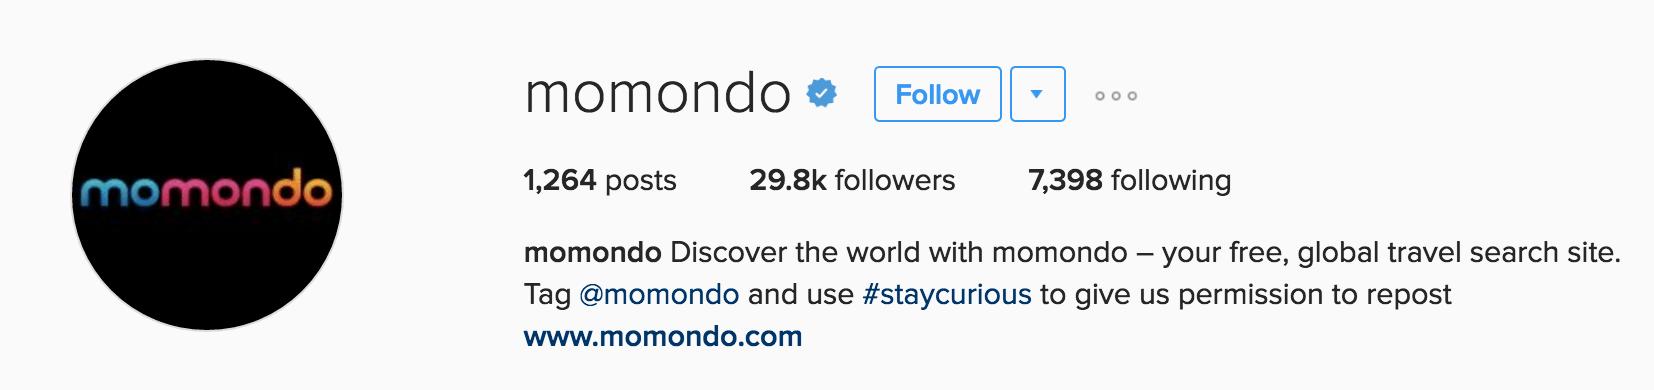 momondo-instagram